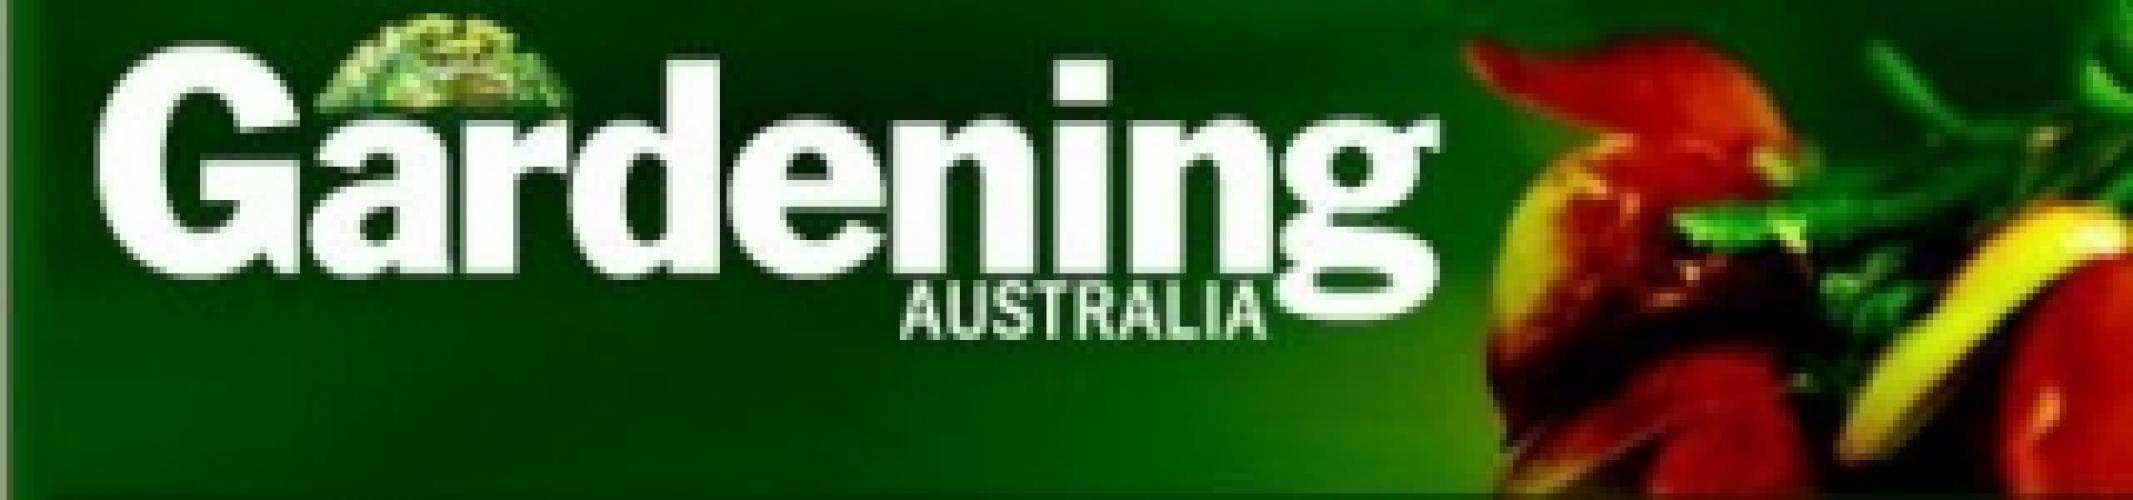 Gardening Australia next episode air date poster